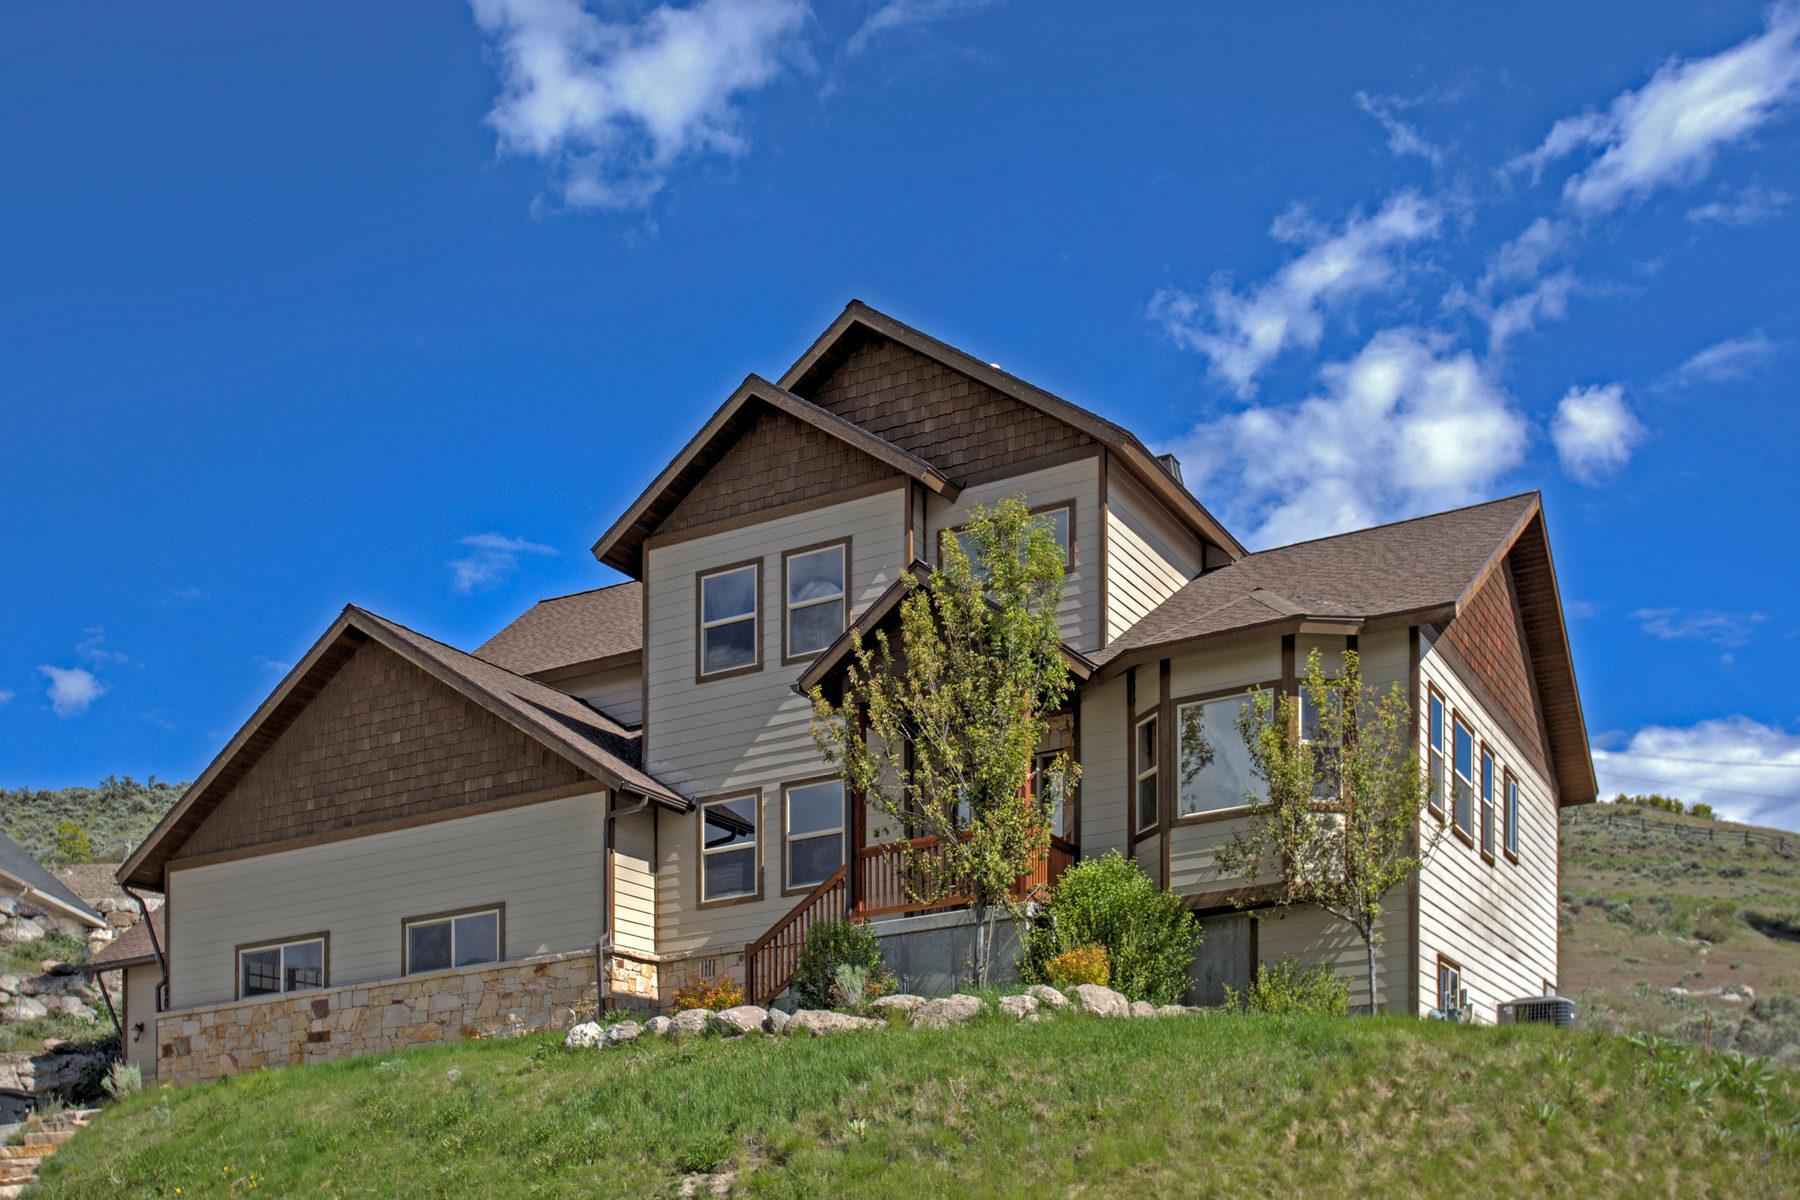 Villa per Vendita alle ore Like-New Cove Estates Home in Heber City 1890 N Callaway Drive Lot #100 Heber City, Utah 84032 Stati Uniti